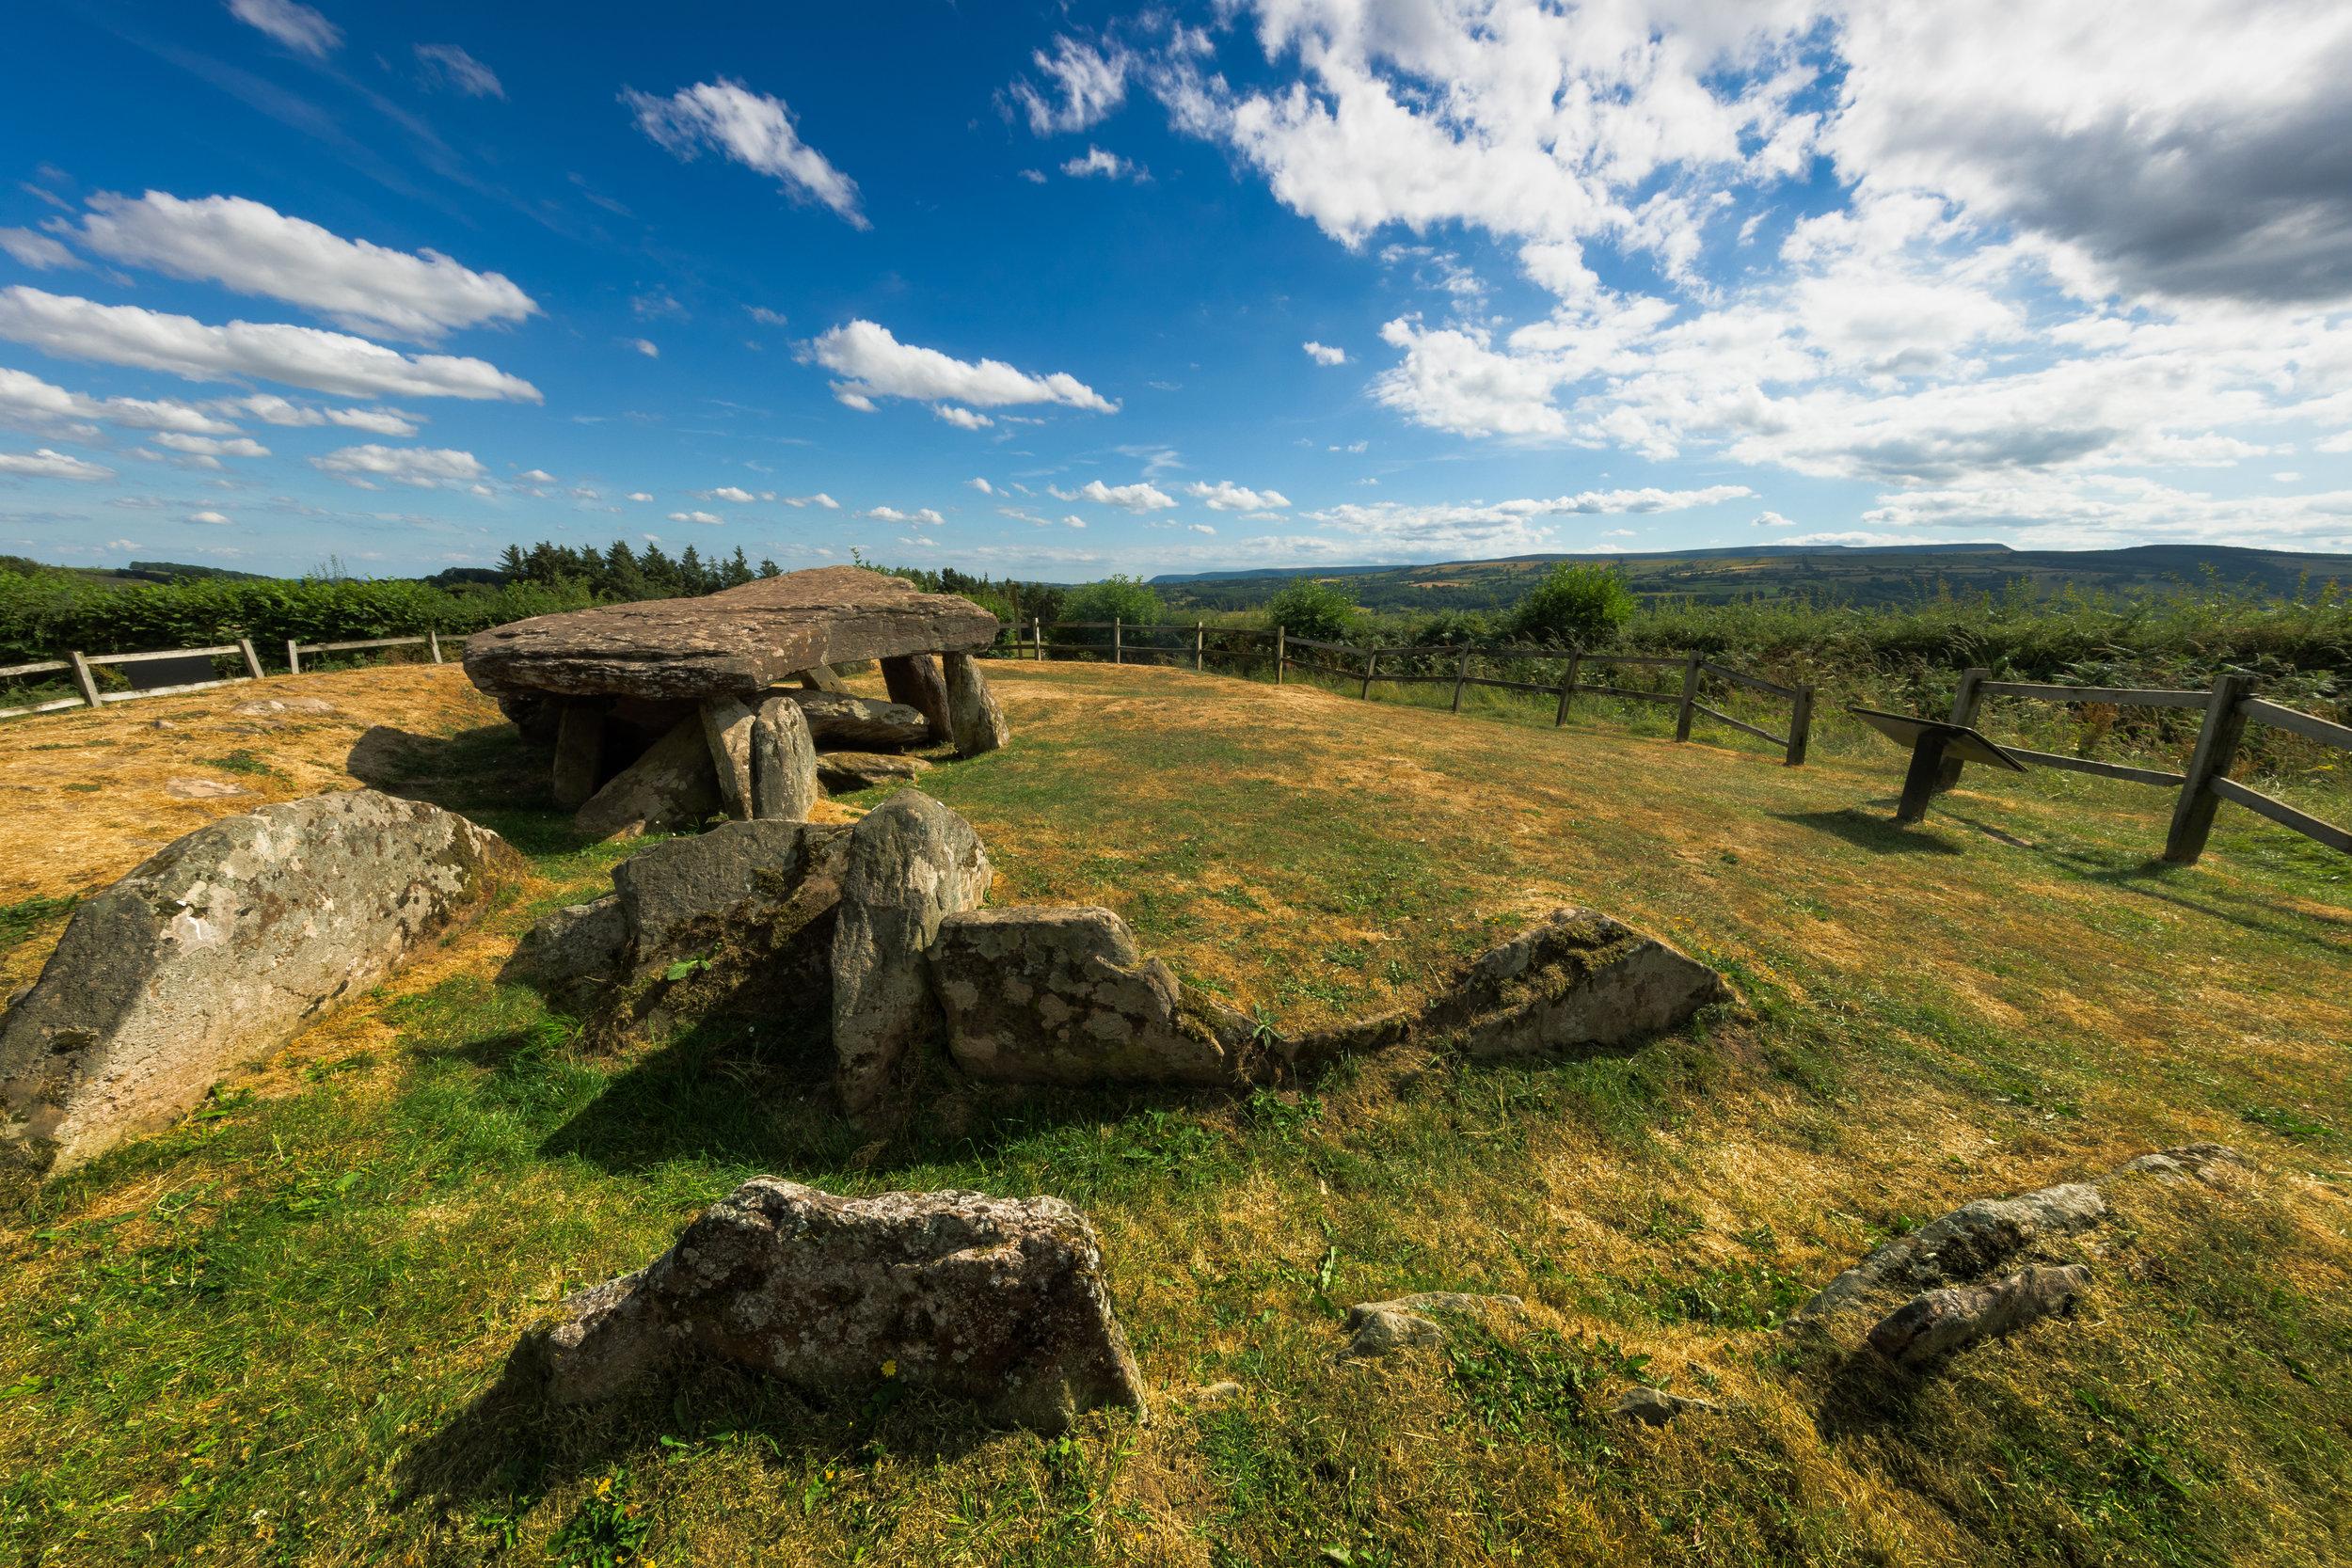 Arthur's Stone Herefordshire © jennifer bailey 2018